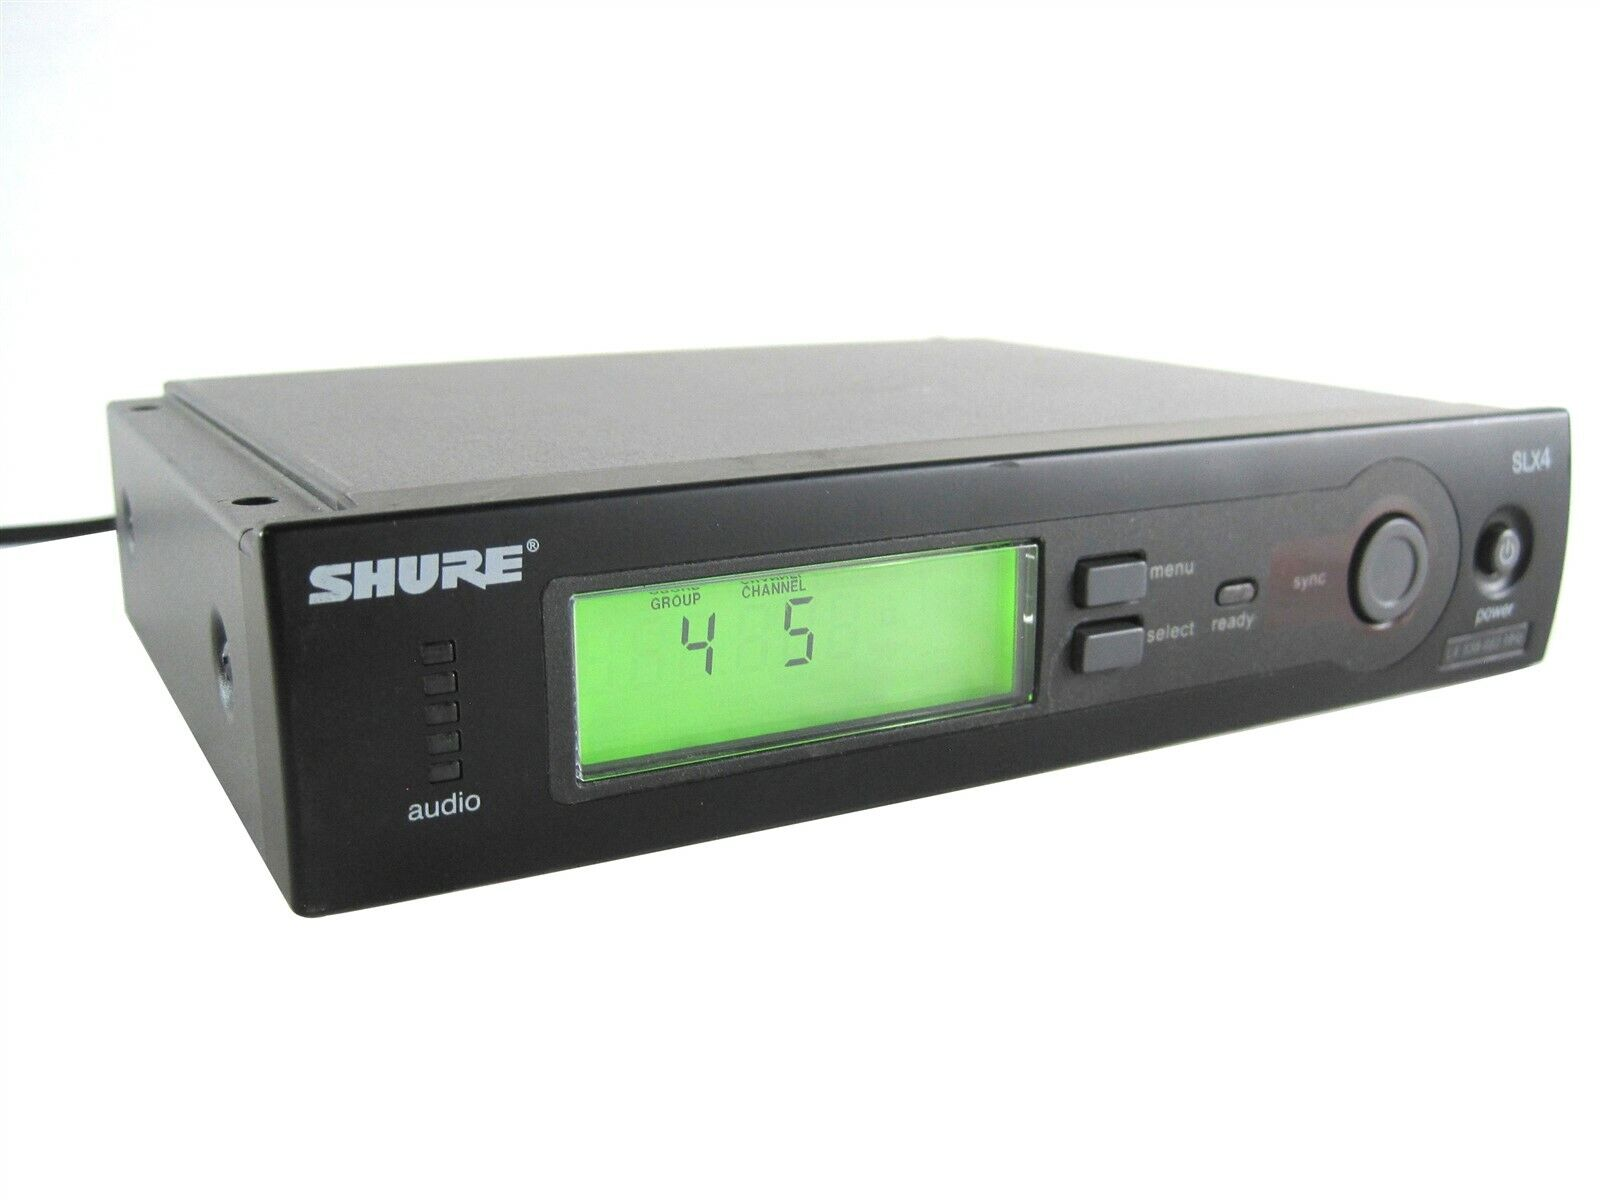 Shure Wireless SLX4 L4 638-662MHz Stage Party PA Microphone Wireless Receiver